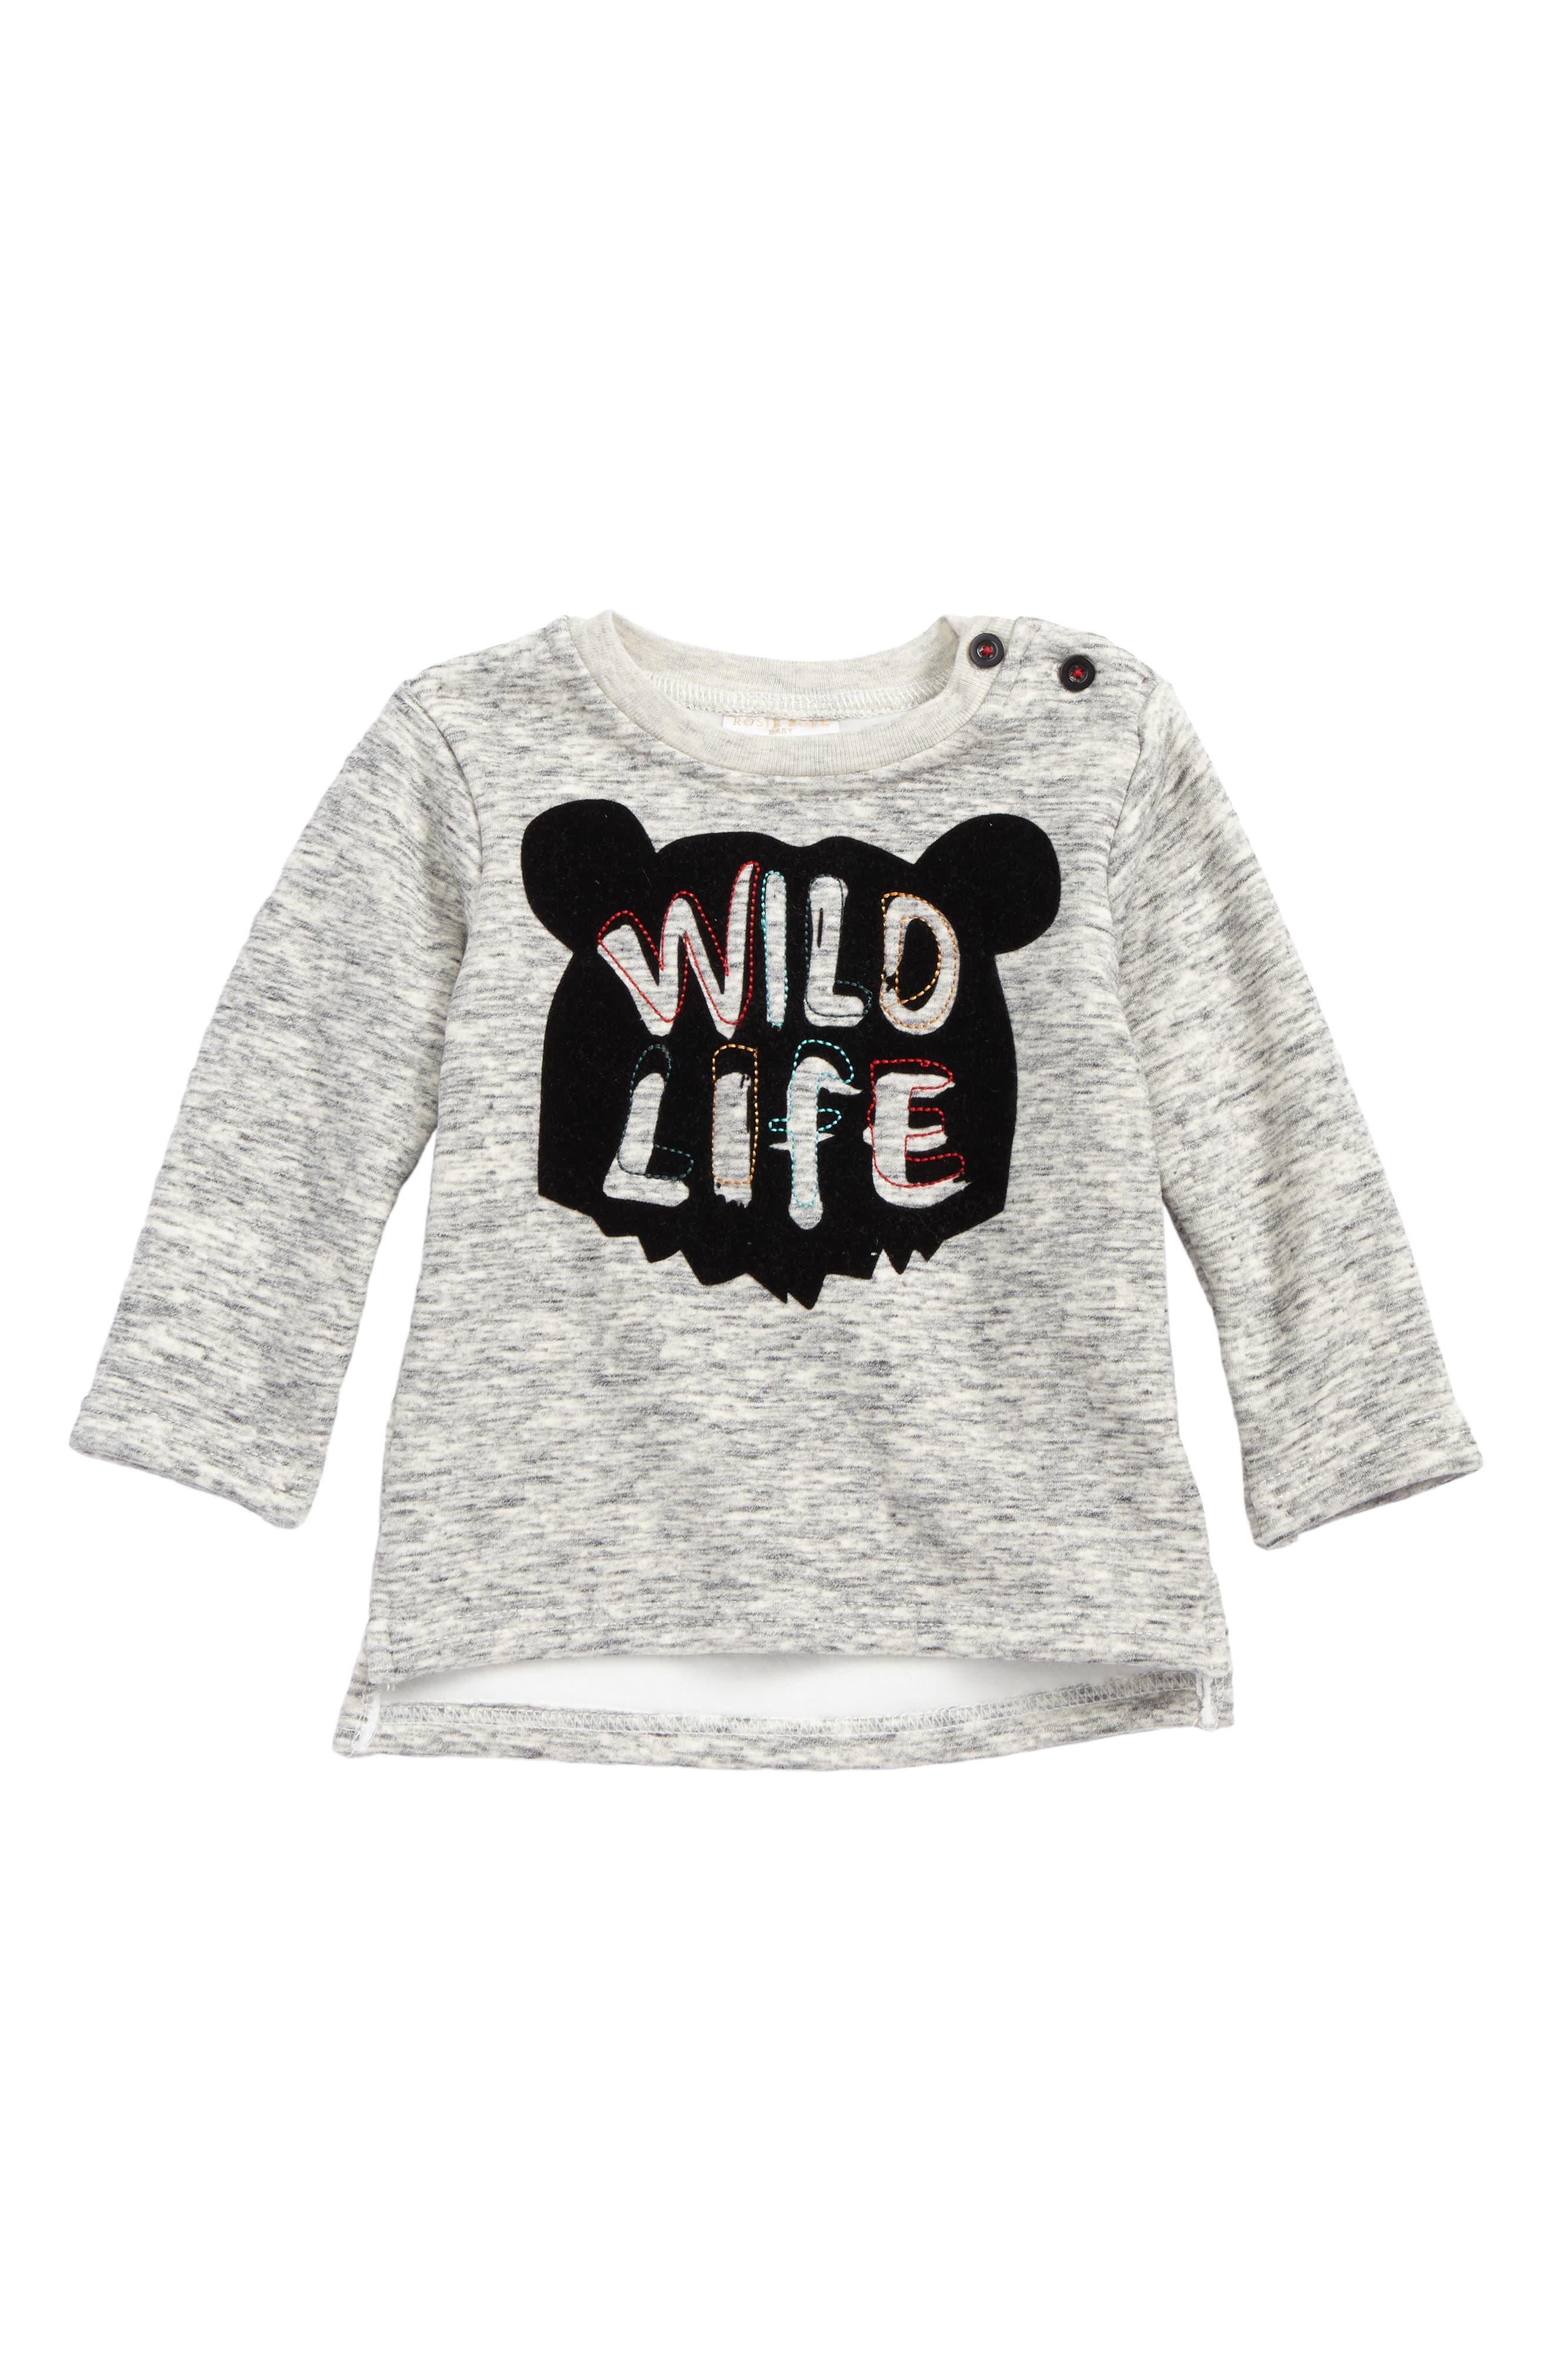 Wild Life Sweatshirt,                         Main,                         color, 030